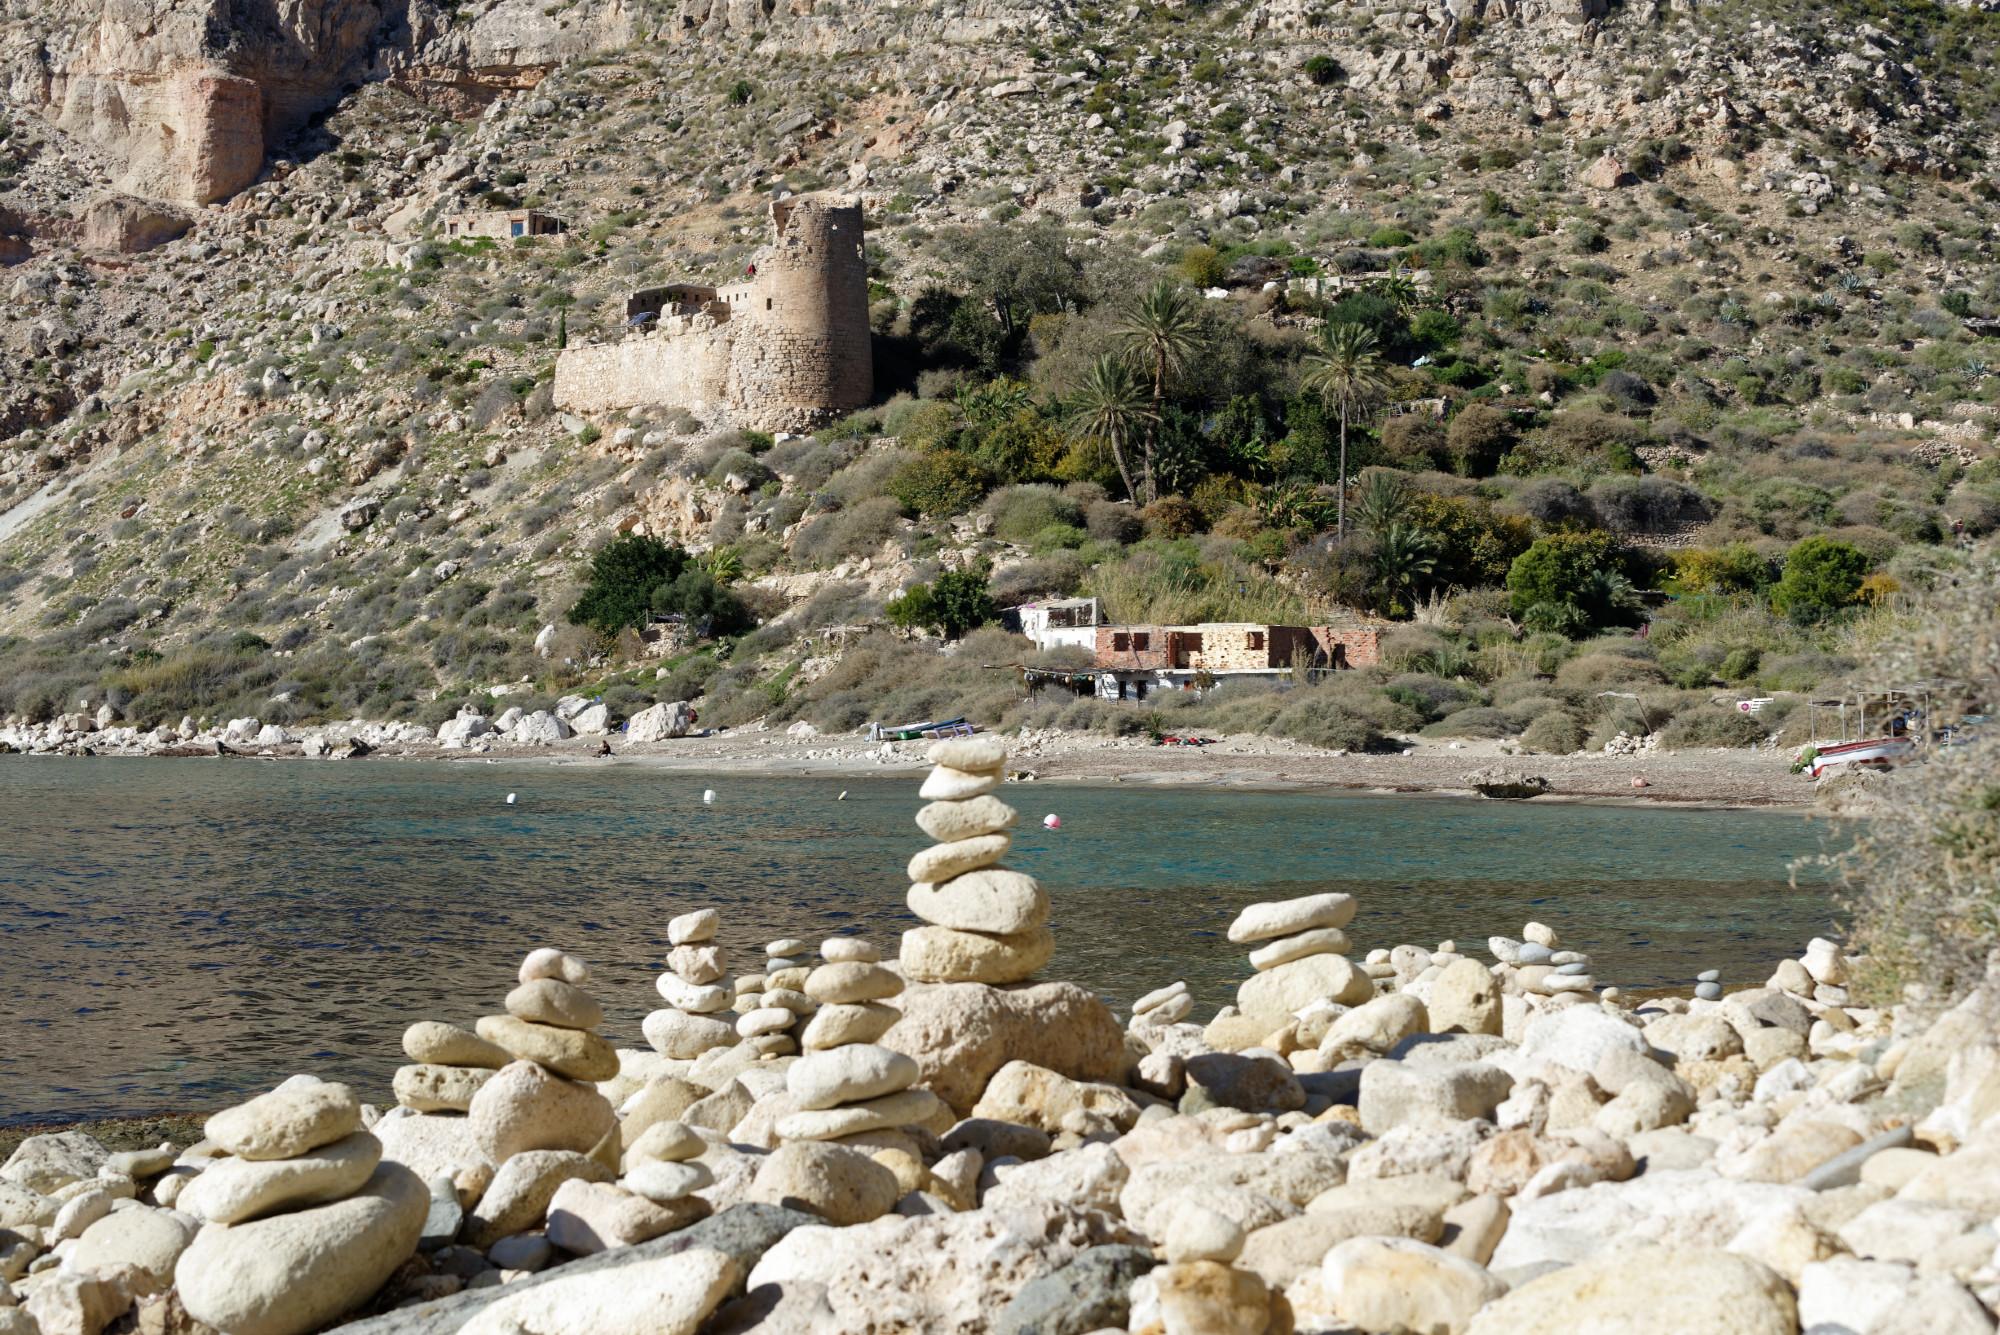 171213-Marche Las Negras-Cala San Pedro-Las Negras (71) (Cabo de Gata-Andalousie)